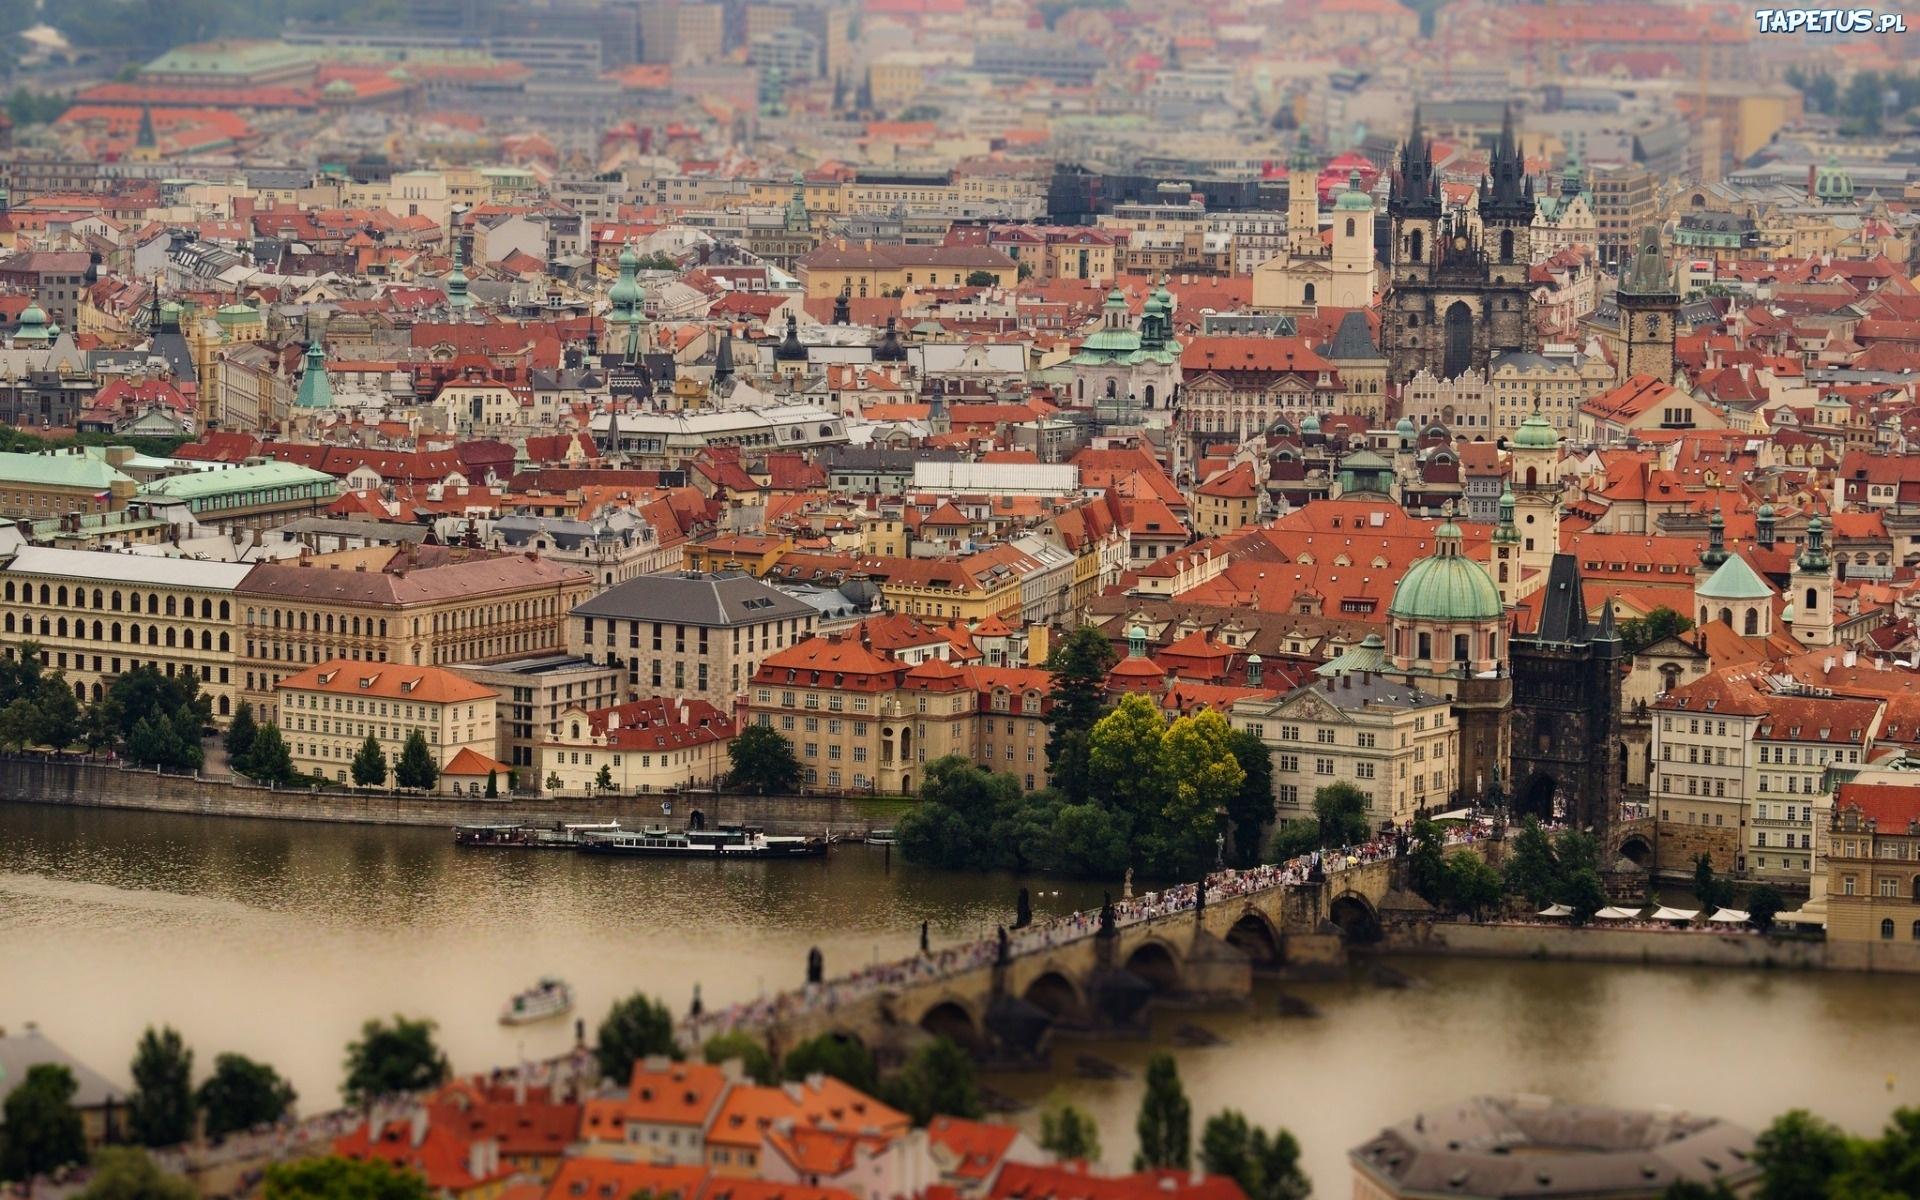 246693_rzeka-most-praga-panorama-miasta.jpg